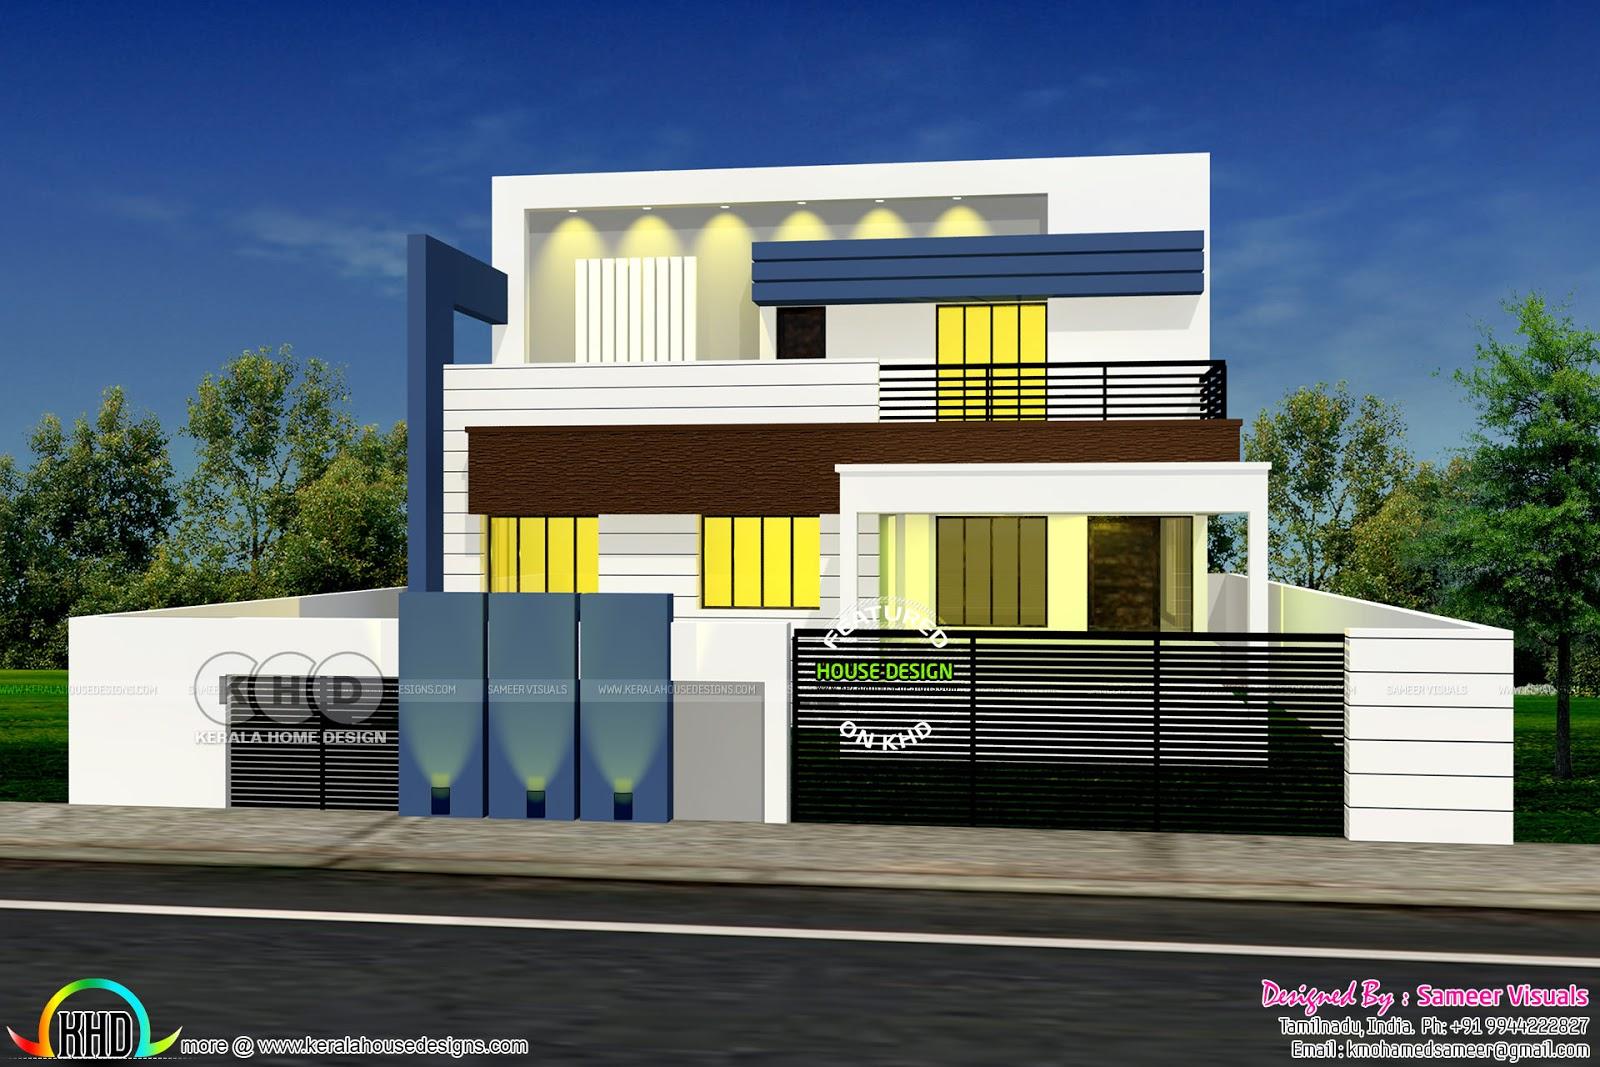 2827 Square Feet South Indian Home Kerala Home Design Bloglovin